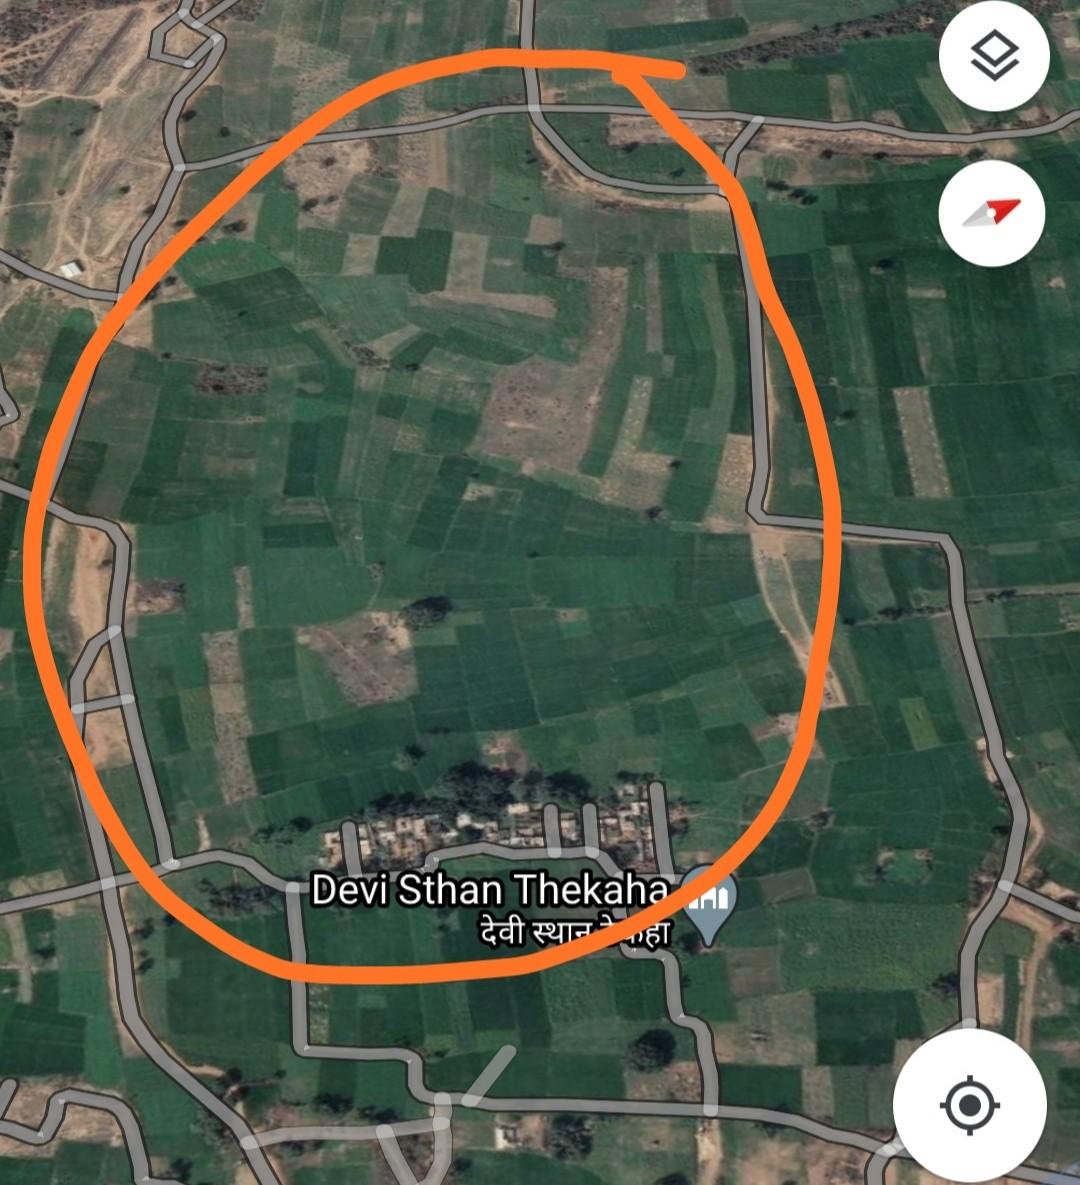 Domestic, Commercial Land For Sale Near Nh30 - 1kilometer Smart City, Smart Valey 4 Kilometer From Bihta New Airport And 7 Kilometer From Bihta Railway Station 1 Kilometer Near Post Office 3.5 Kilometer Maner 1/2 Kilometer Anandpur Home Guard Camp